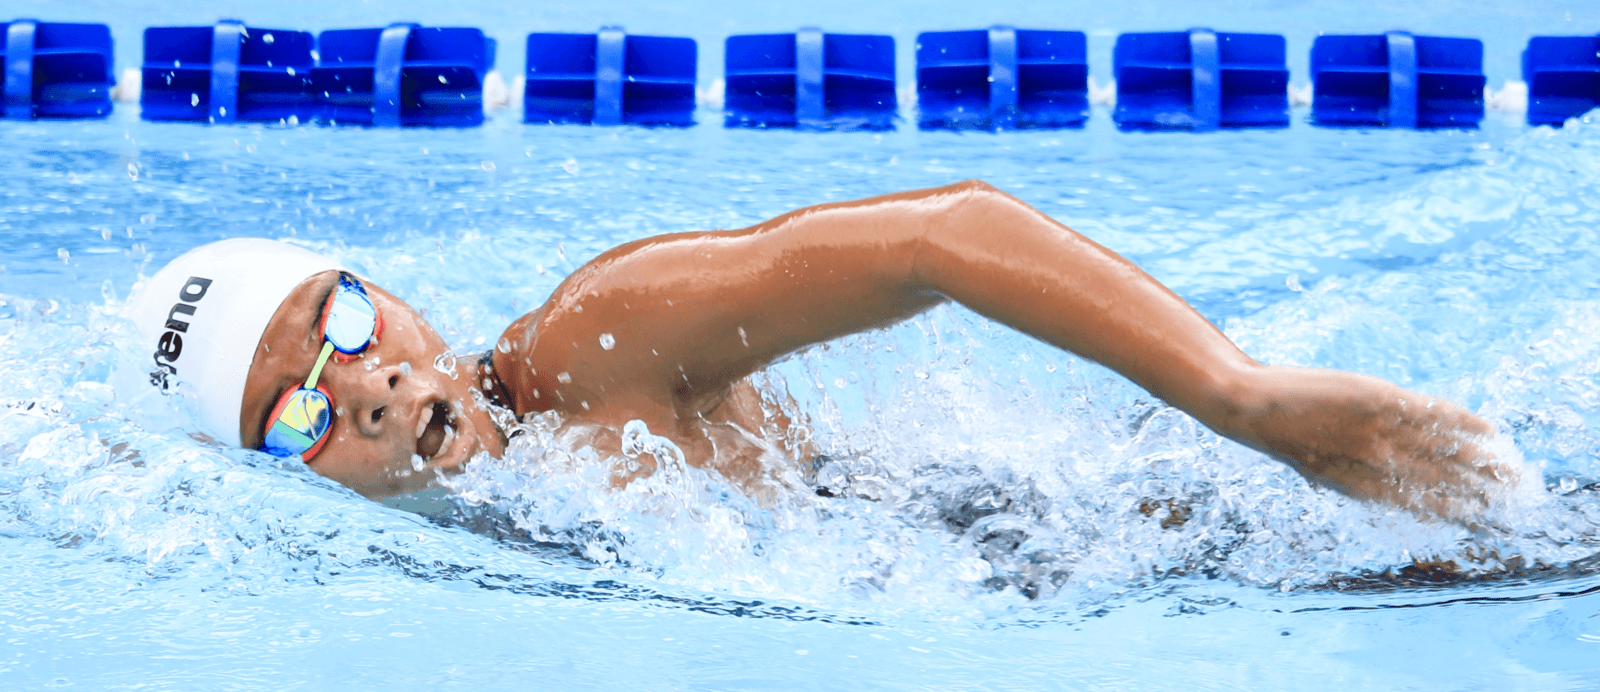 Swim fitting